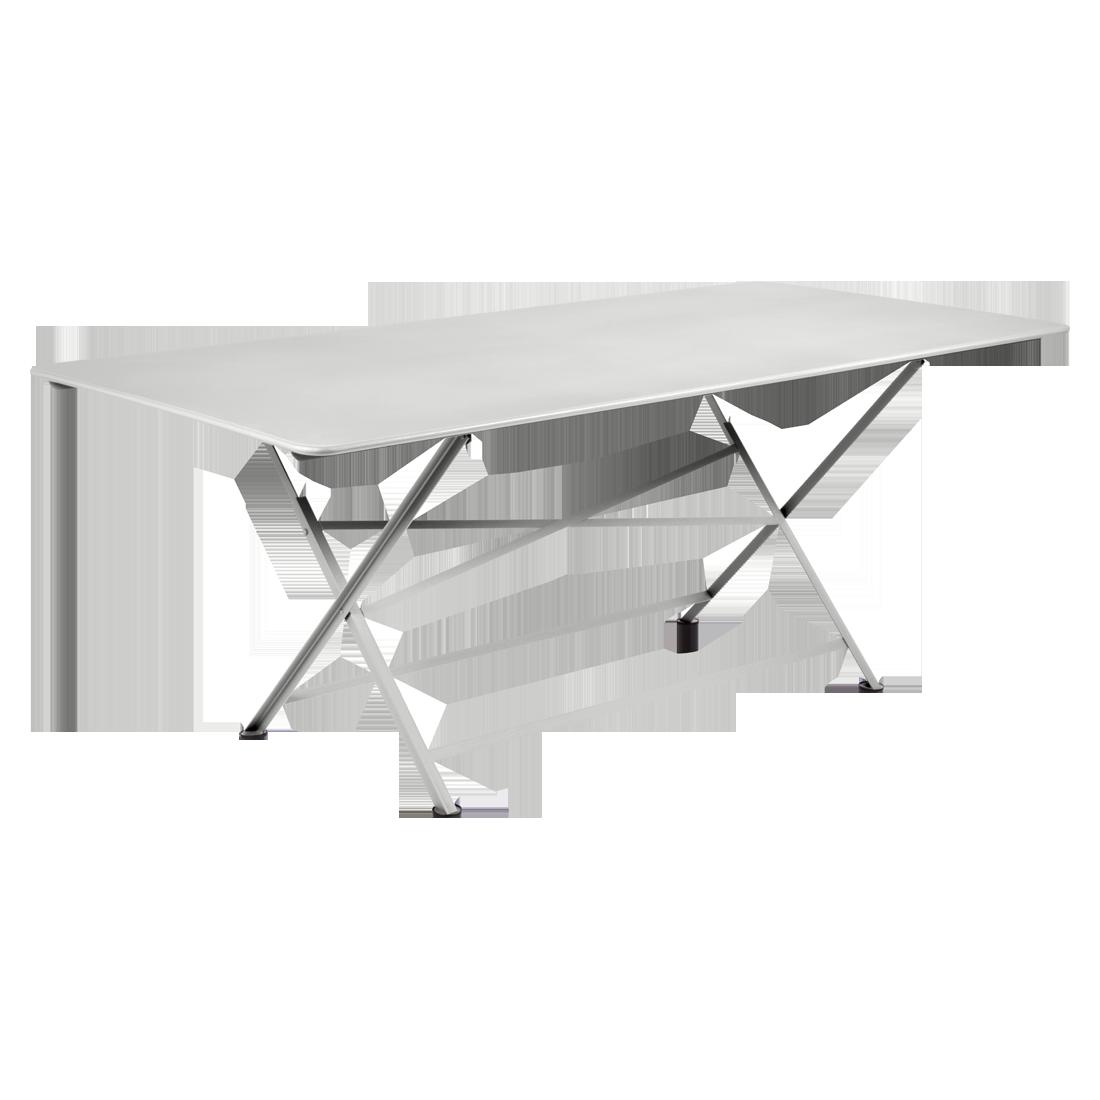 table de jardin, table metal, table de jardin pliante, table metal pliante, table fermob gris